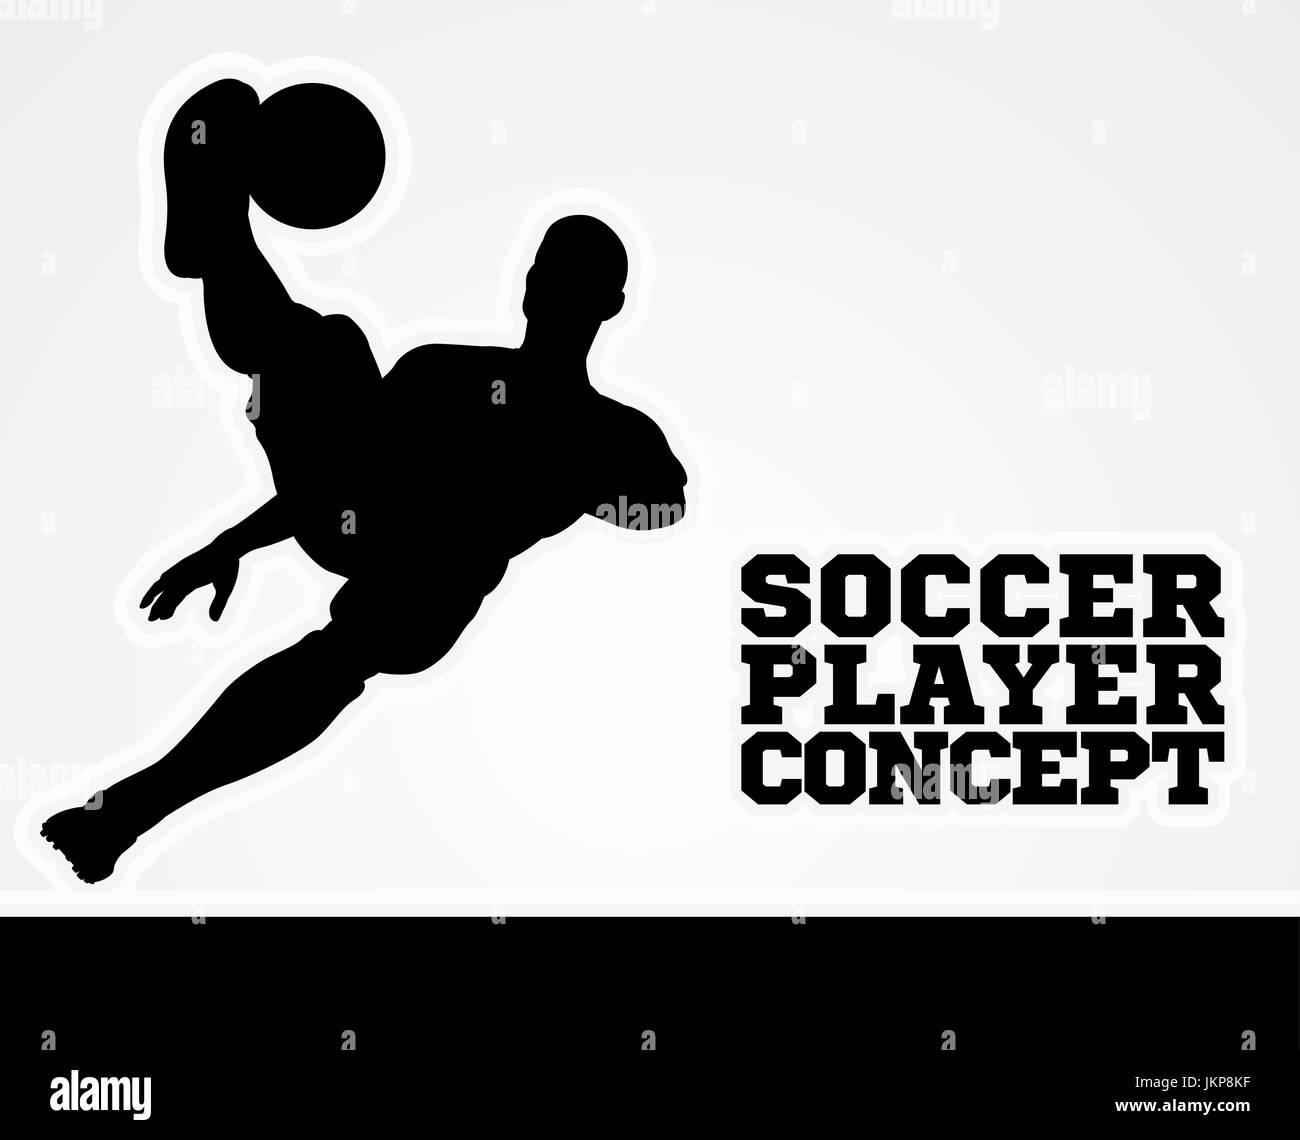 Soccer Football Player Concept Silhouette - Stock Vector